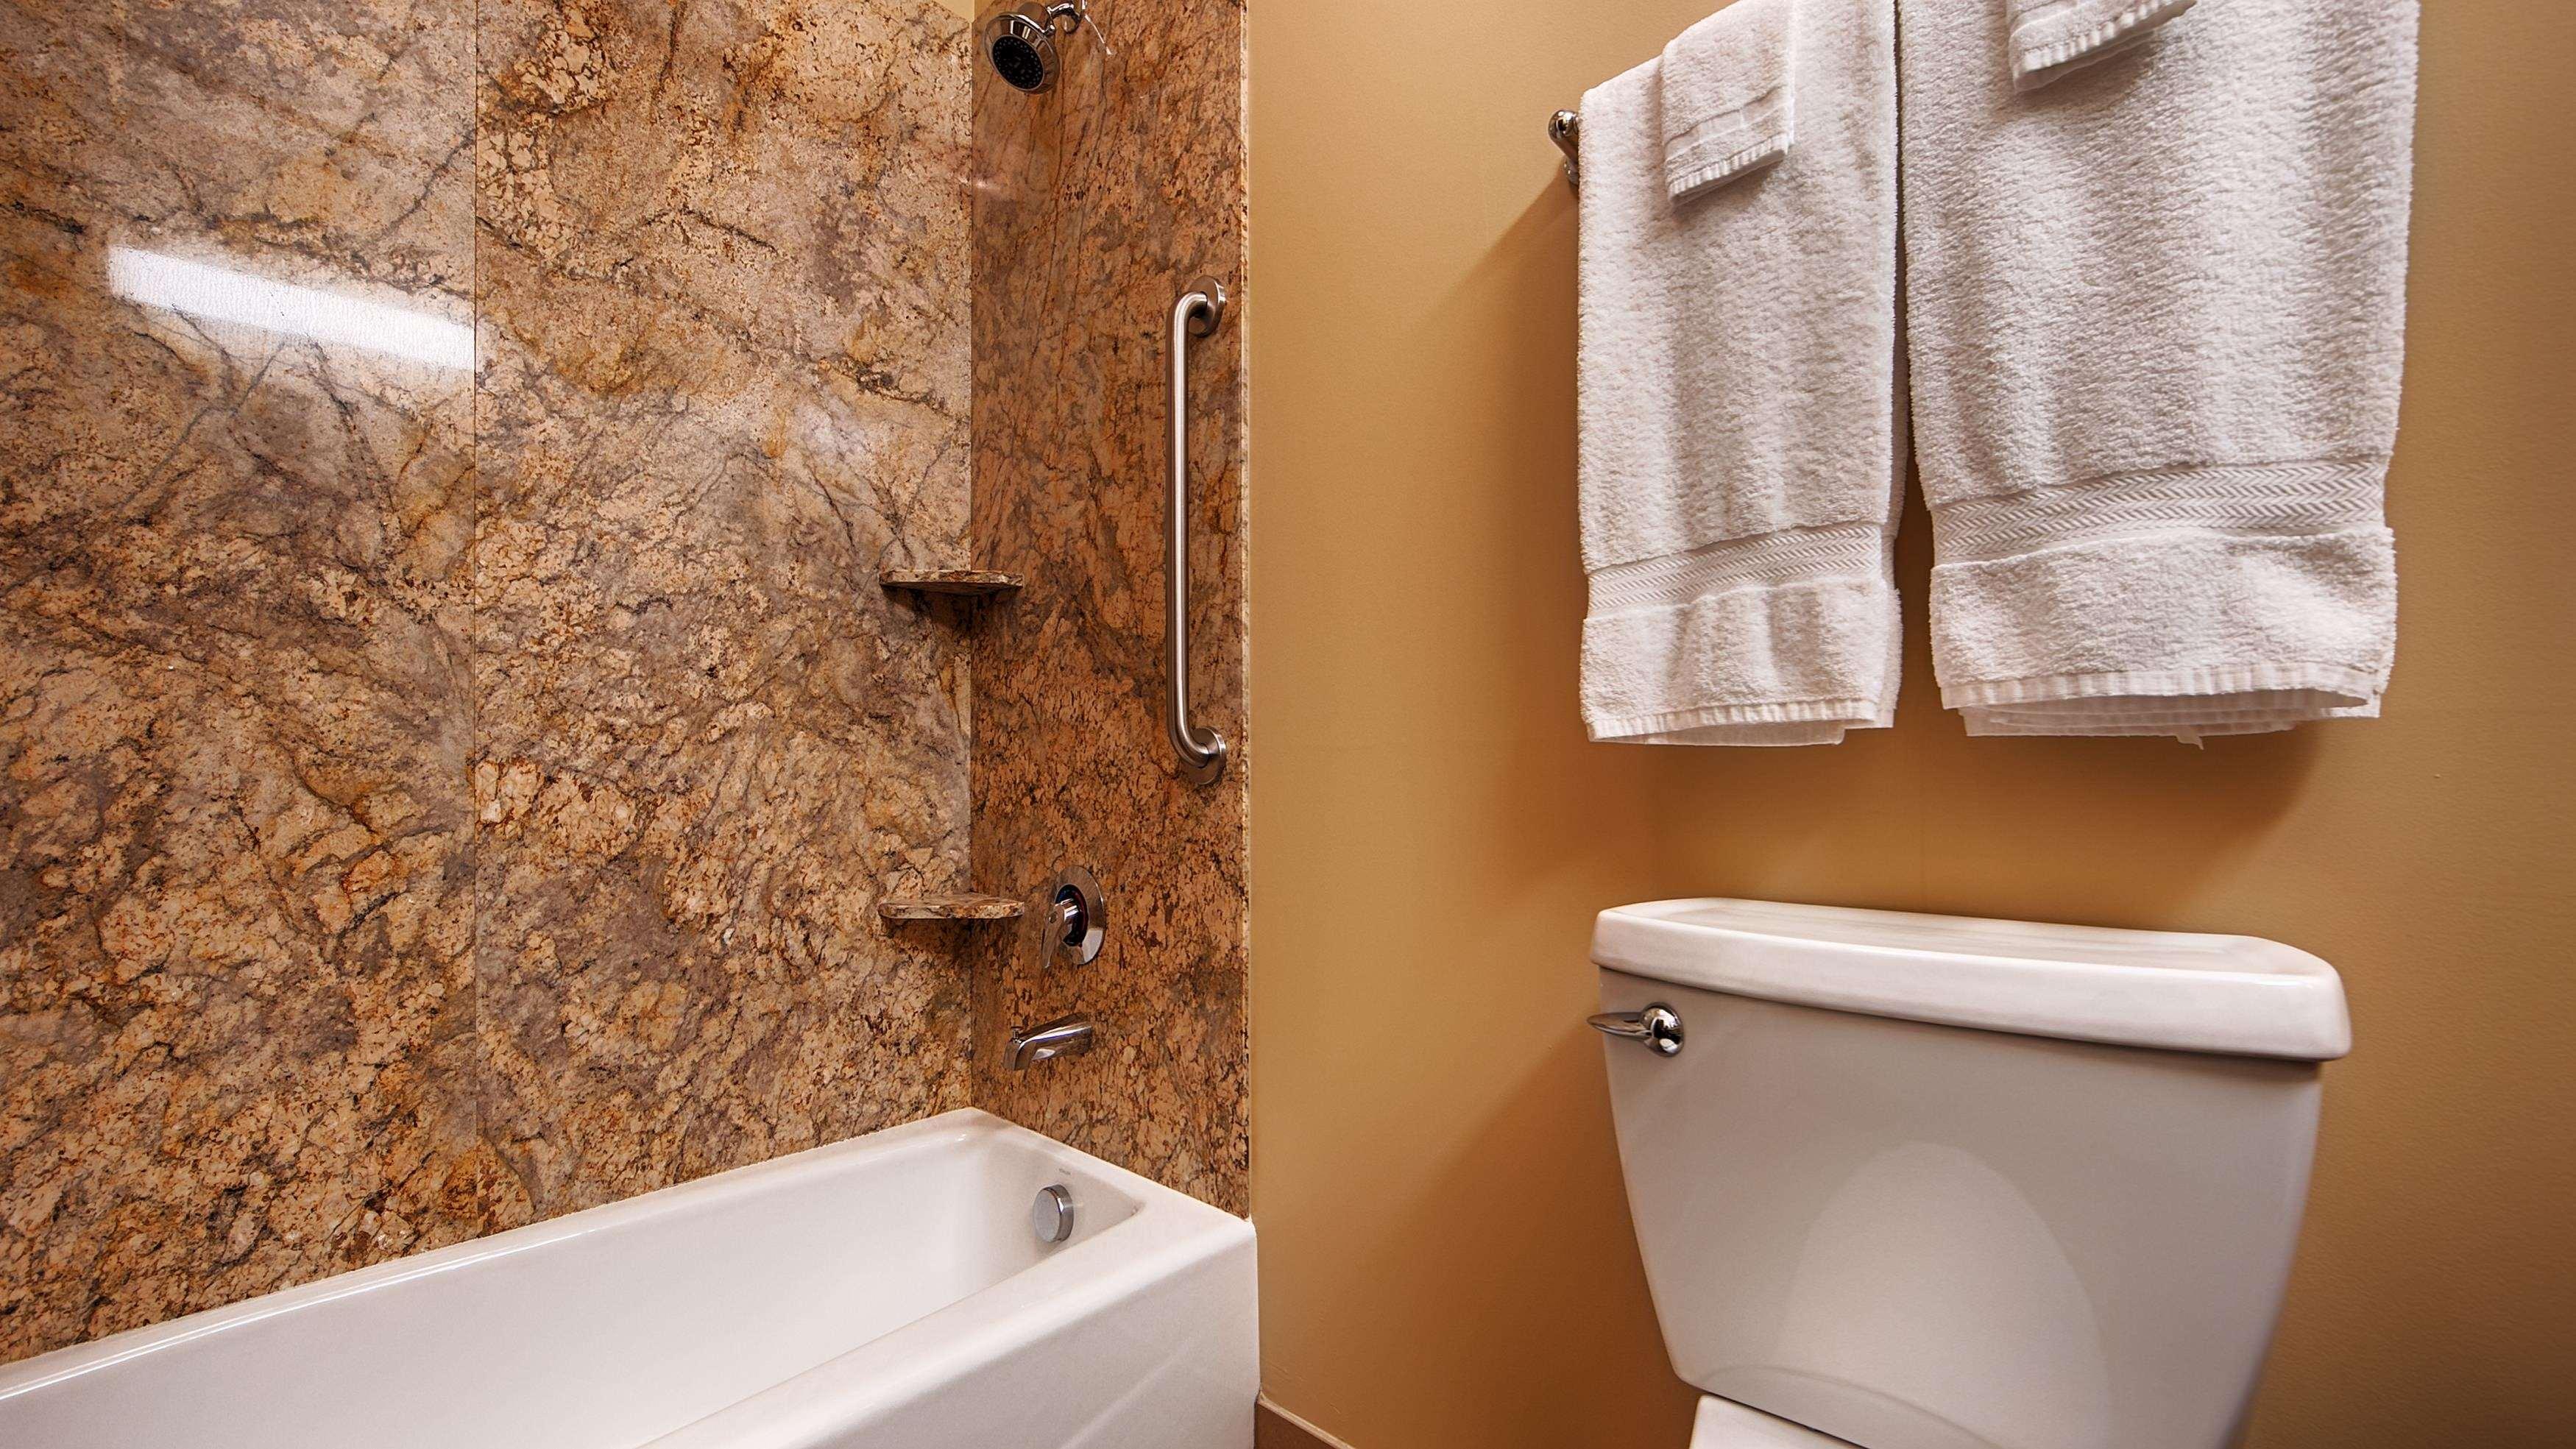 Best Western Plus Lacey Inn & Suites image 24